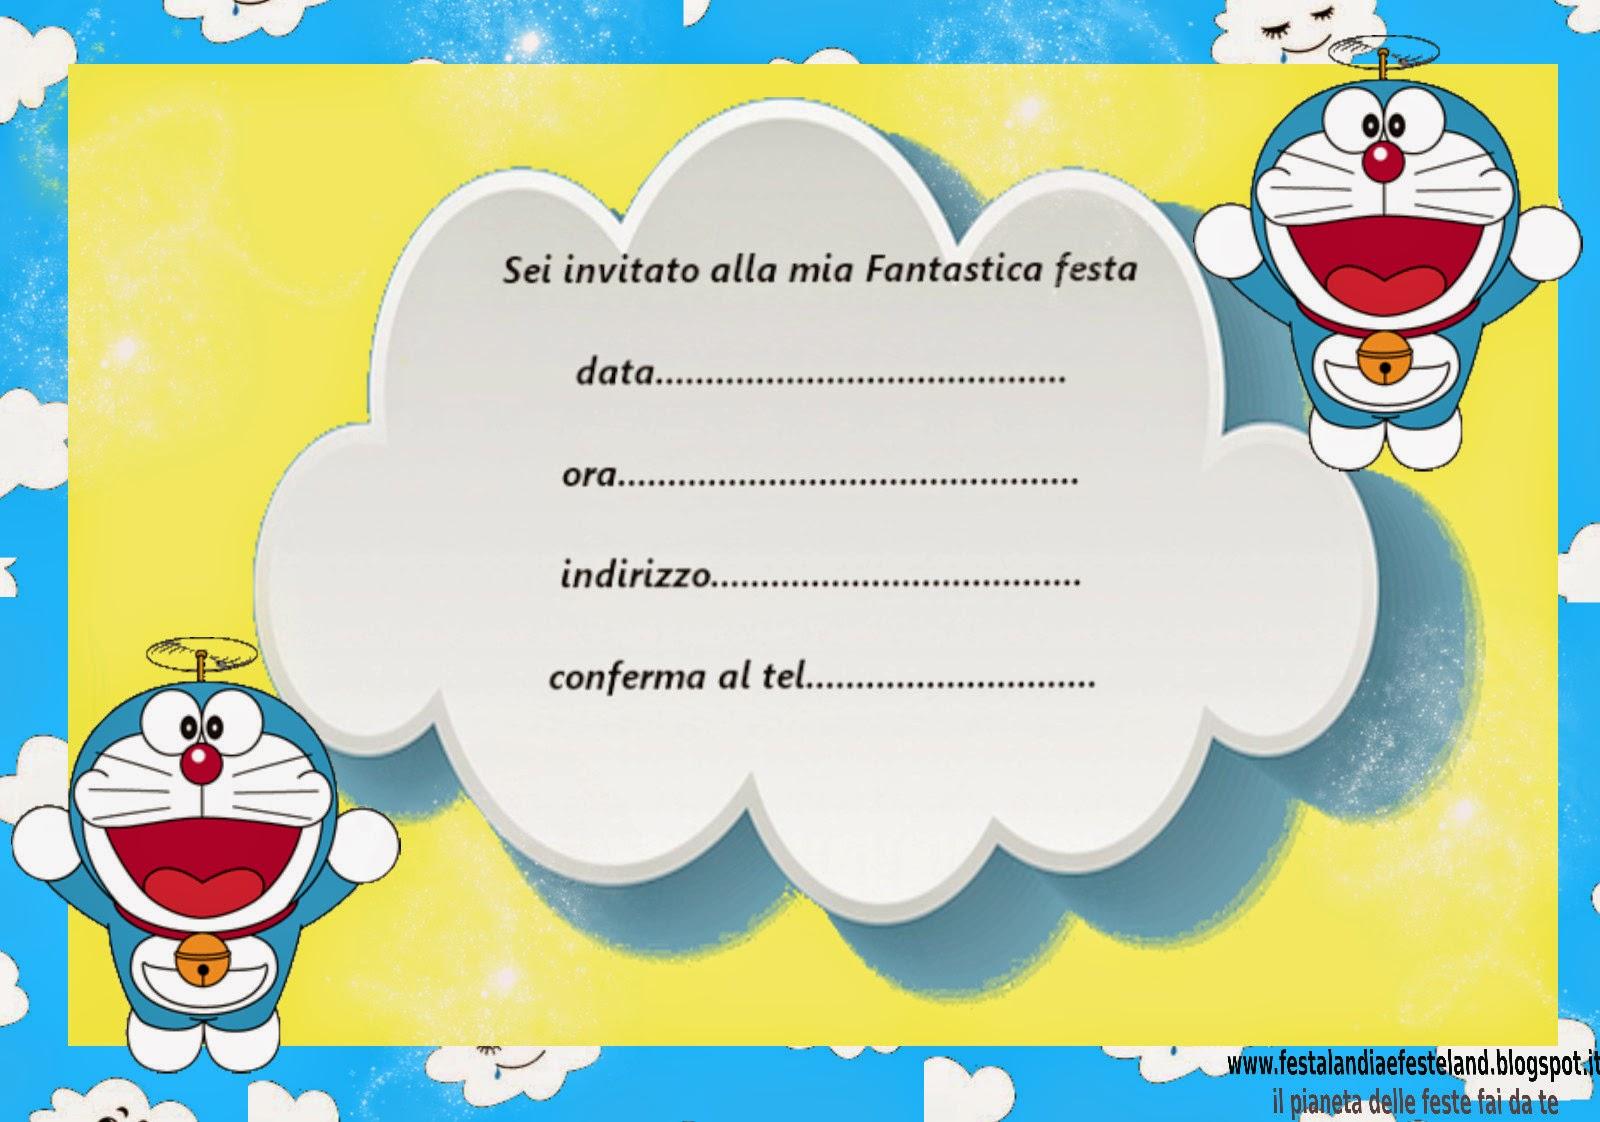 Amato Festalandia e Festeland: Doraemon party kit gratis JE56